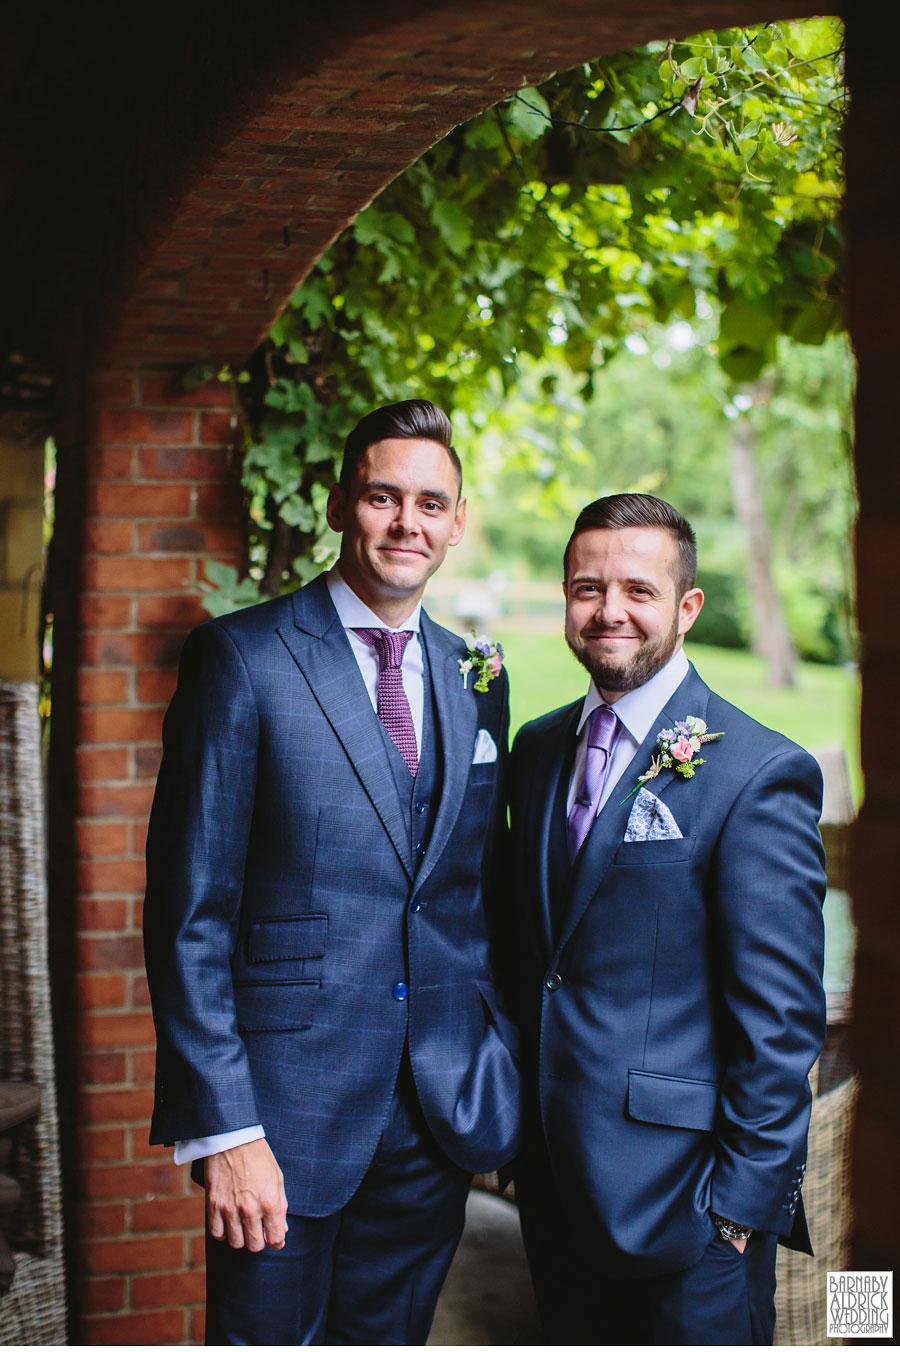 Pheasant Harome Wedding Photography by Yorkshire Wedding Photographer Barnaby Aldrick 023